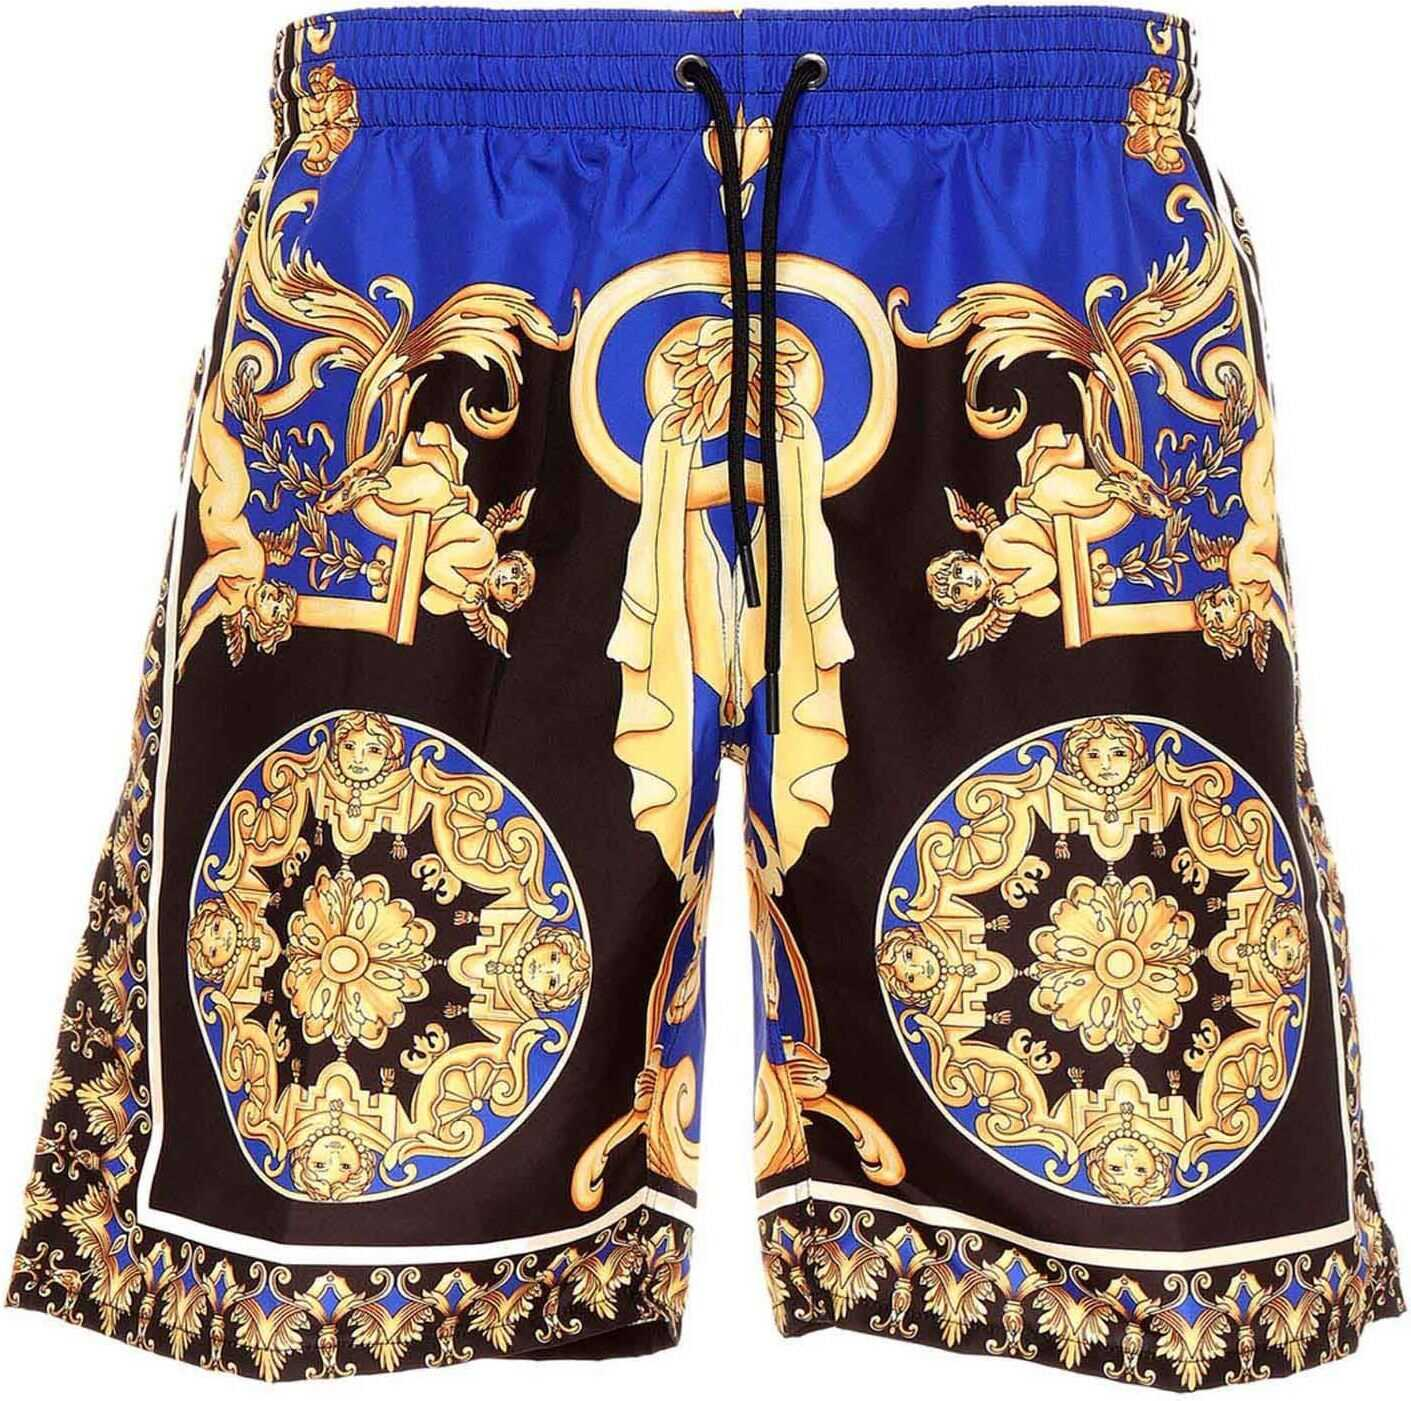 Versace Swim Shorts In Blue And Yellow Multi imagine